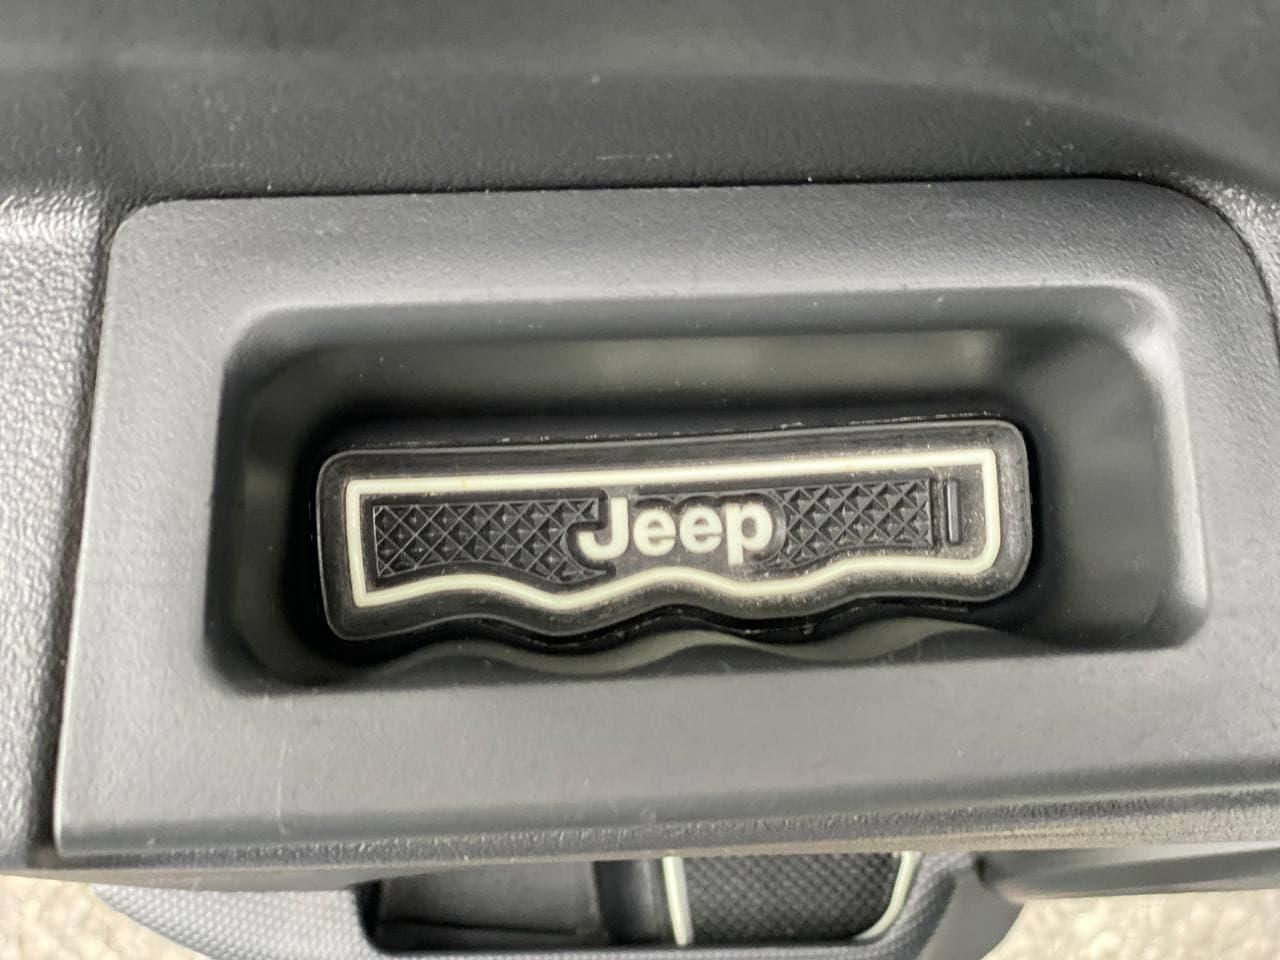 Продан 6 Сентября 2021! Sold September 6, 2021!  Jeep Patriot North Edition 2015 год, автомат, полный привод, 2.4 бензин! Маленький пробег! Без ДТП, Чистый Карфакс, 1 Хозяин!!!! WOW!!! full